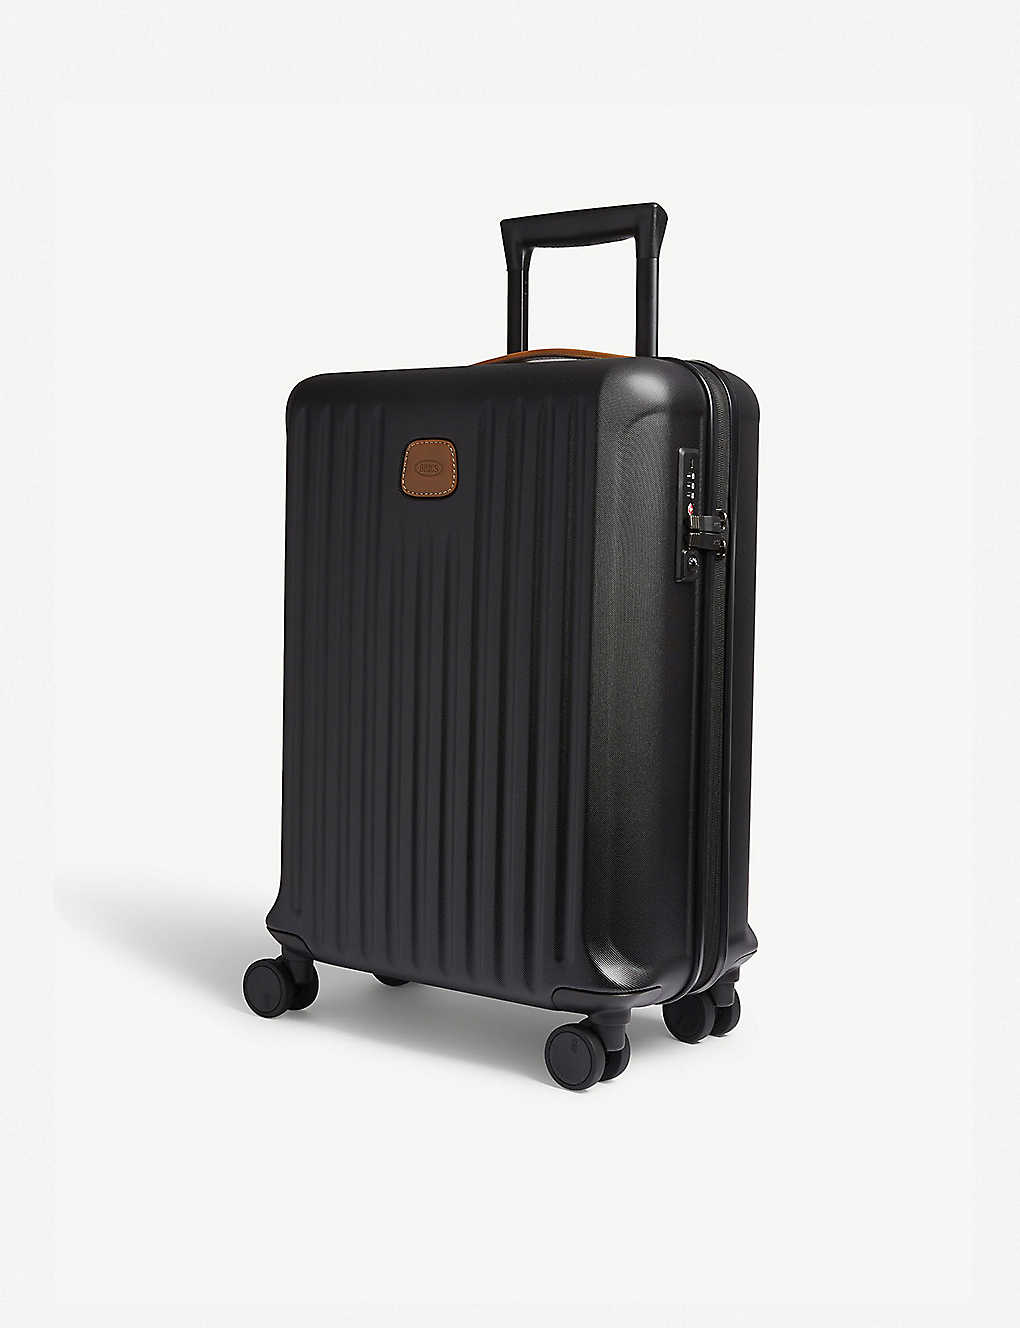 f0524e7ee5ab ... BRICS Capri matt hard case carry-on suitcase 55cm zoom ...